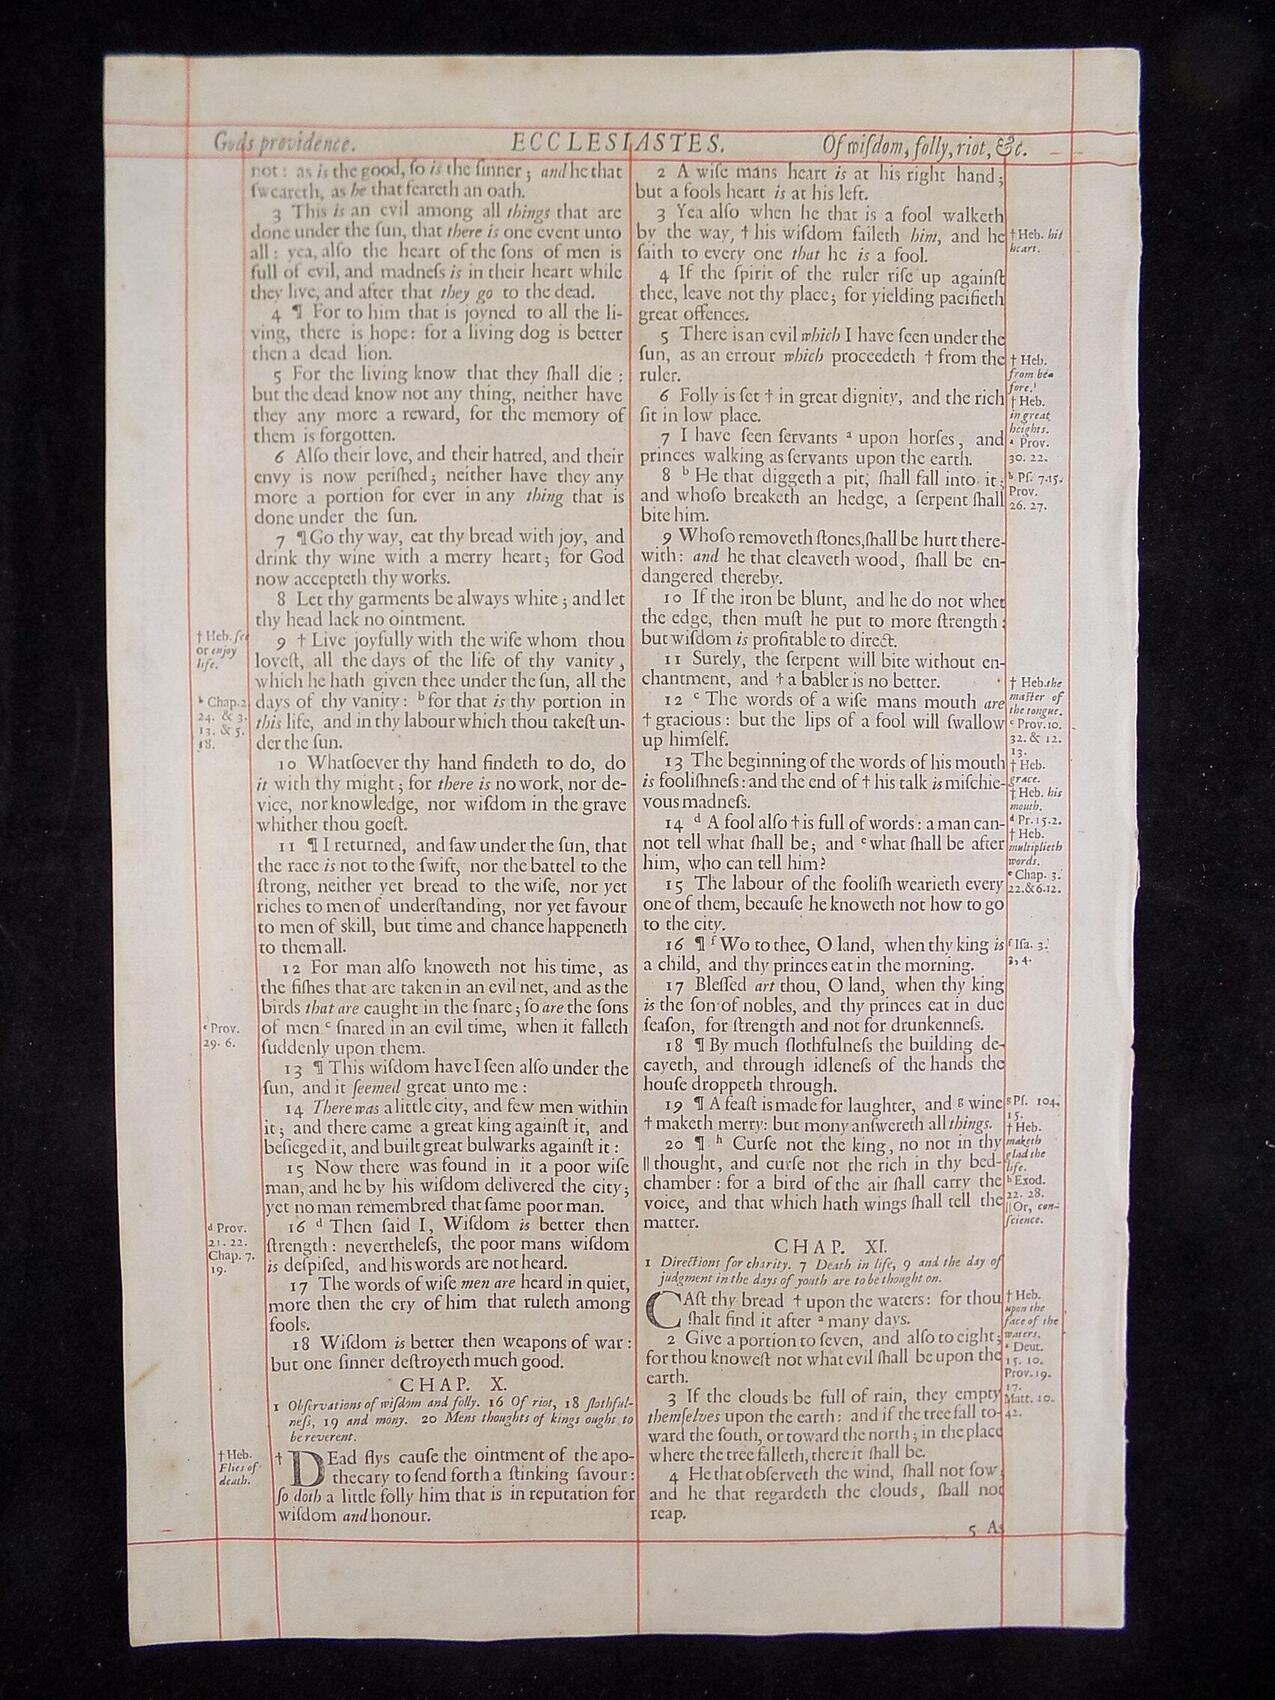 1680 OXFORD KJV ECCLESIASTES LEAVES